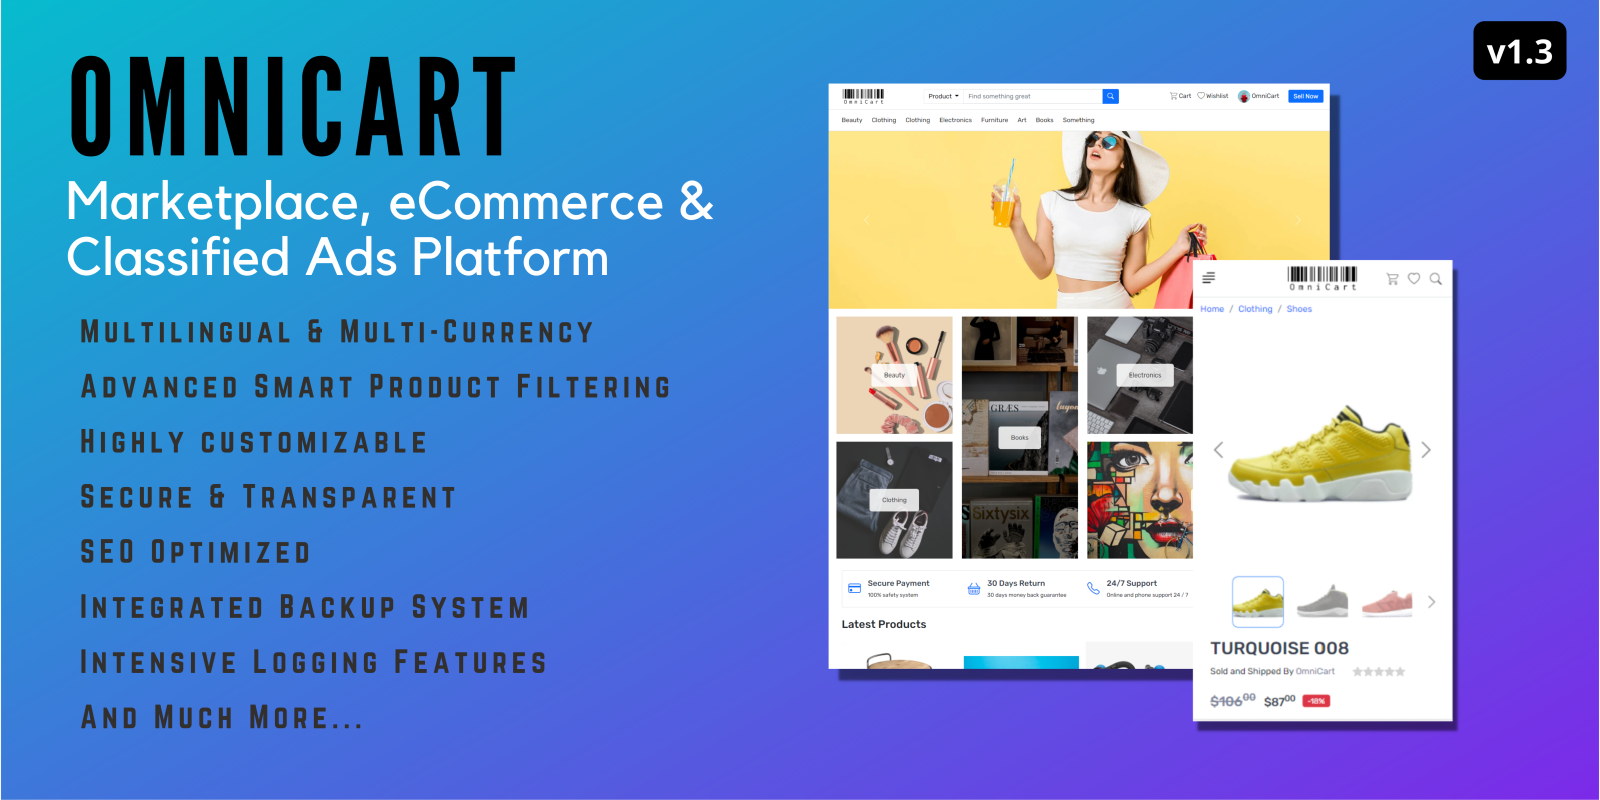 OmniCart - Marketplace, eCommerce & Classified Ads Platform